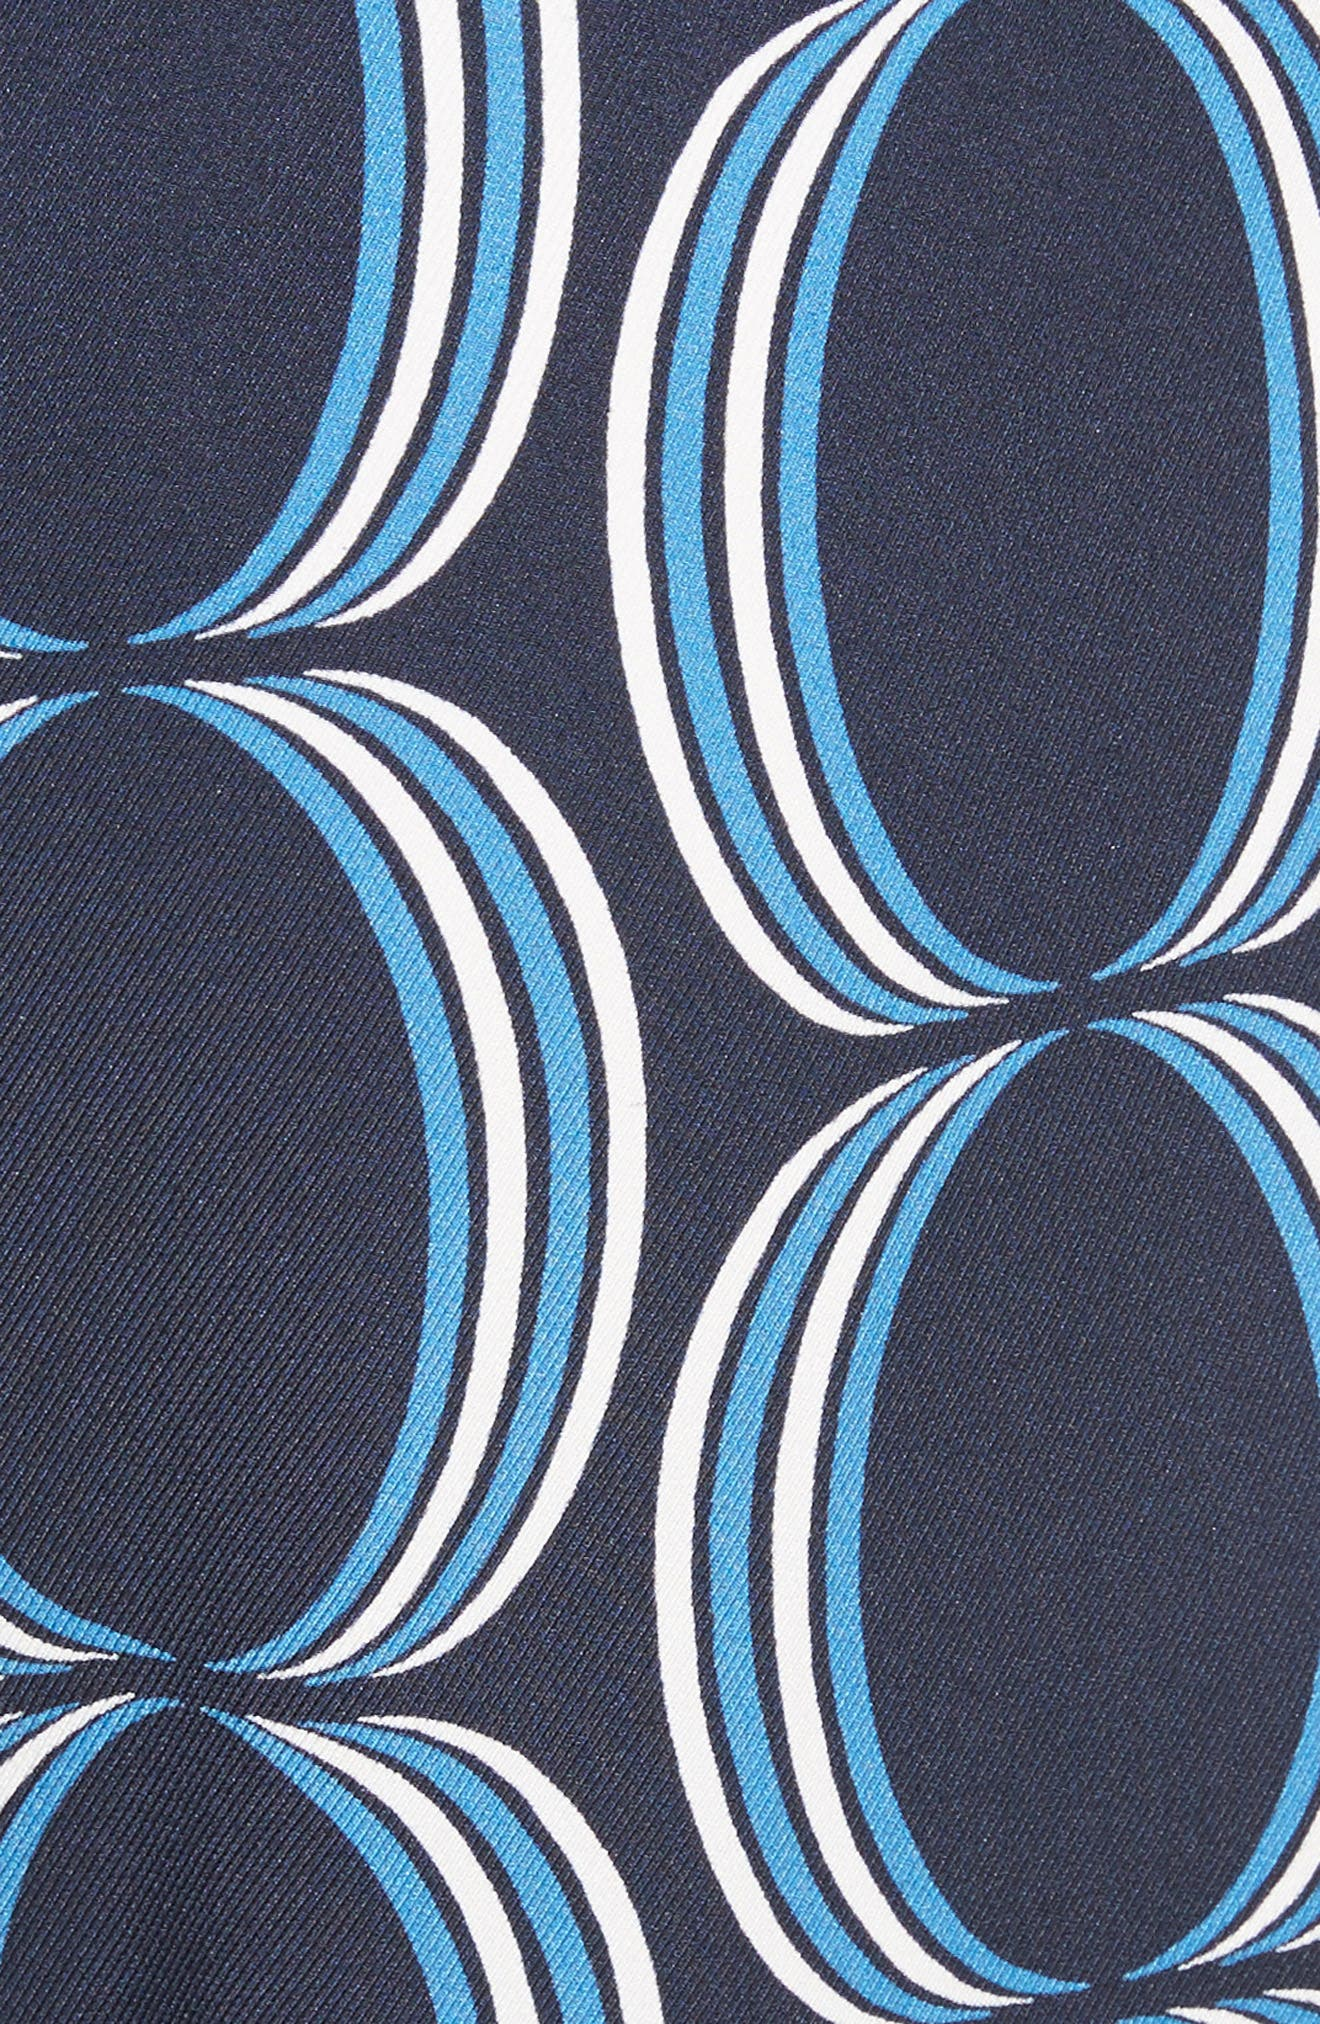 Alternate Image 5  - St. John Collection Oval Print Stretch Silk Twill Pants